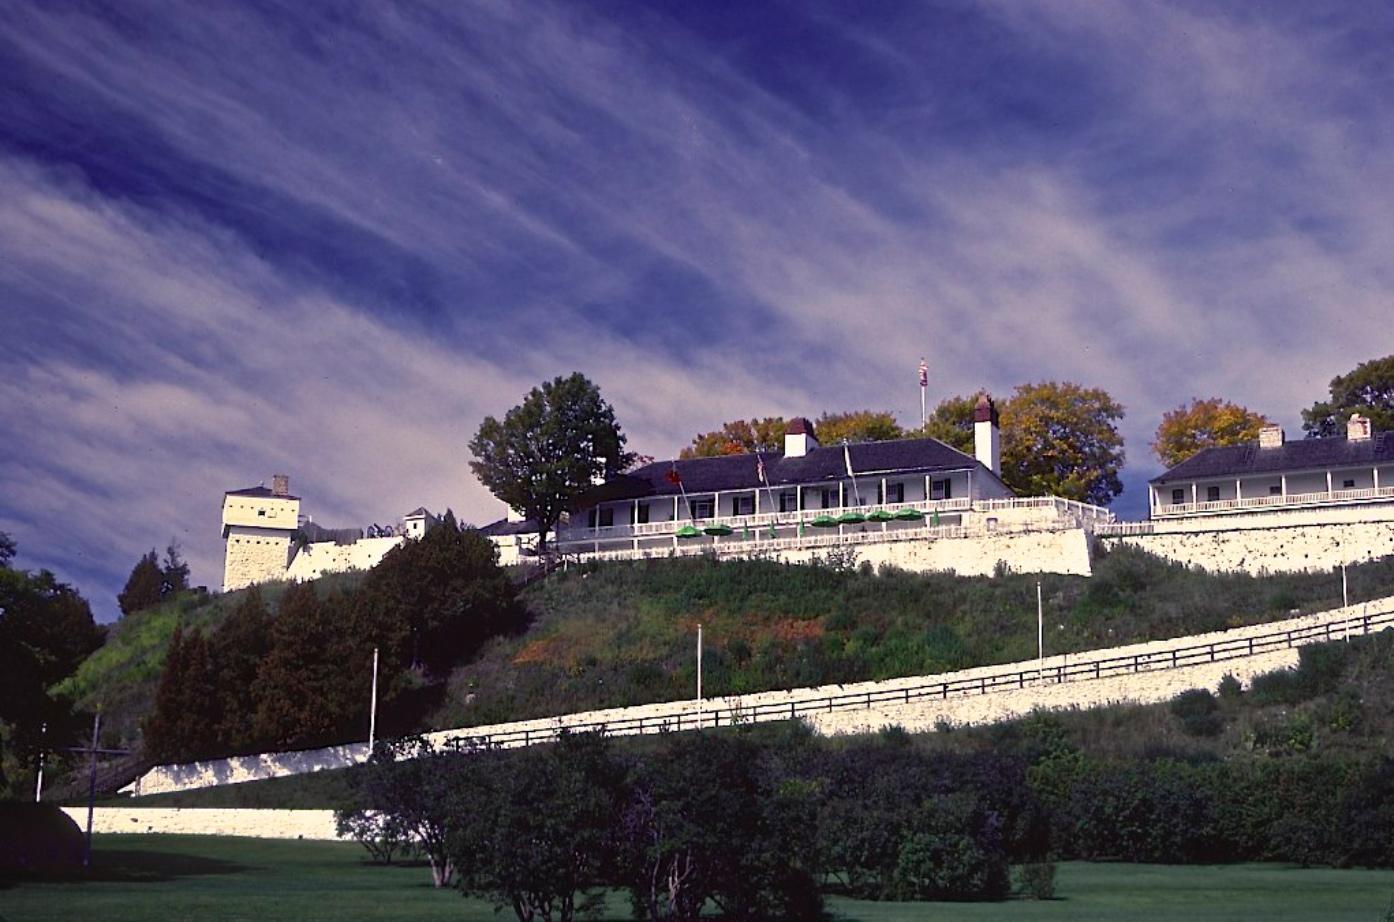 fort-mackinac-mackinac-island-mi-by-bill-johnson